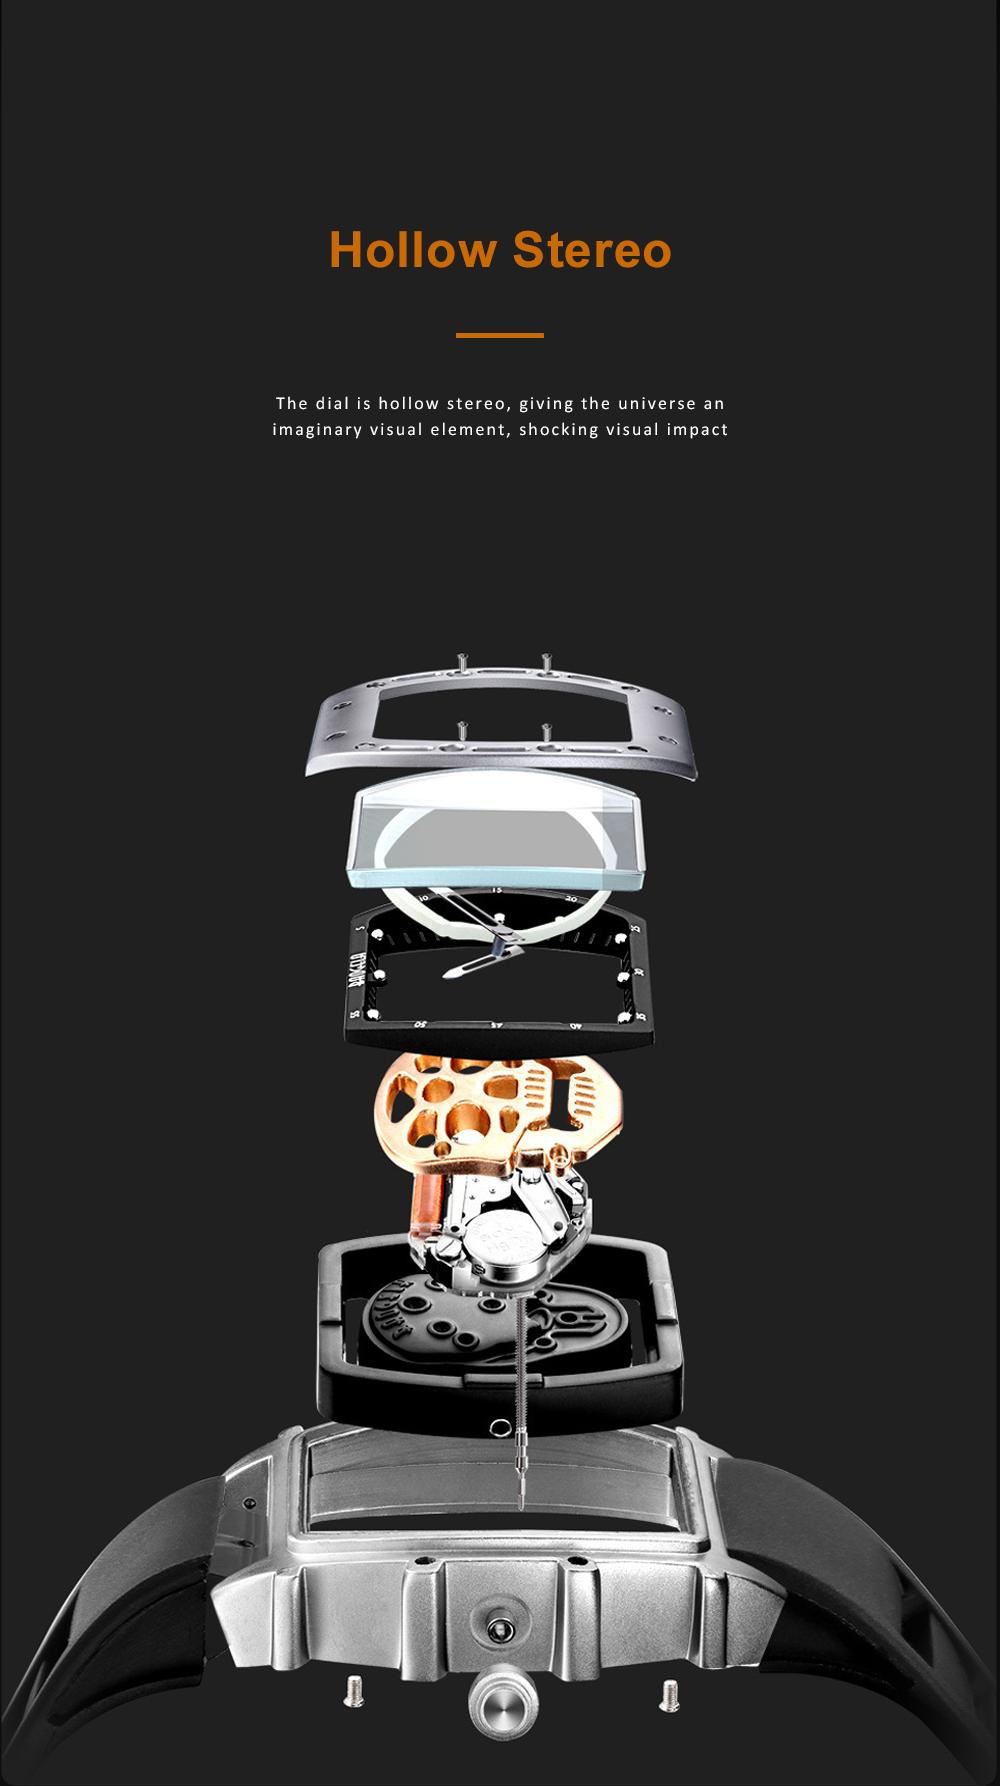 2020 Hot Sell Watches Men Luxury Brand Automatic Silicone Shantou Hollow Men's Quartz Watch Waterproof Movement 3